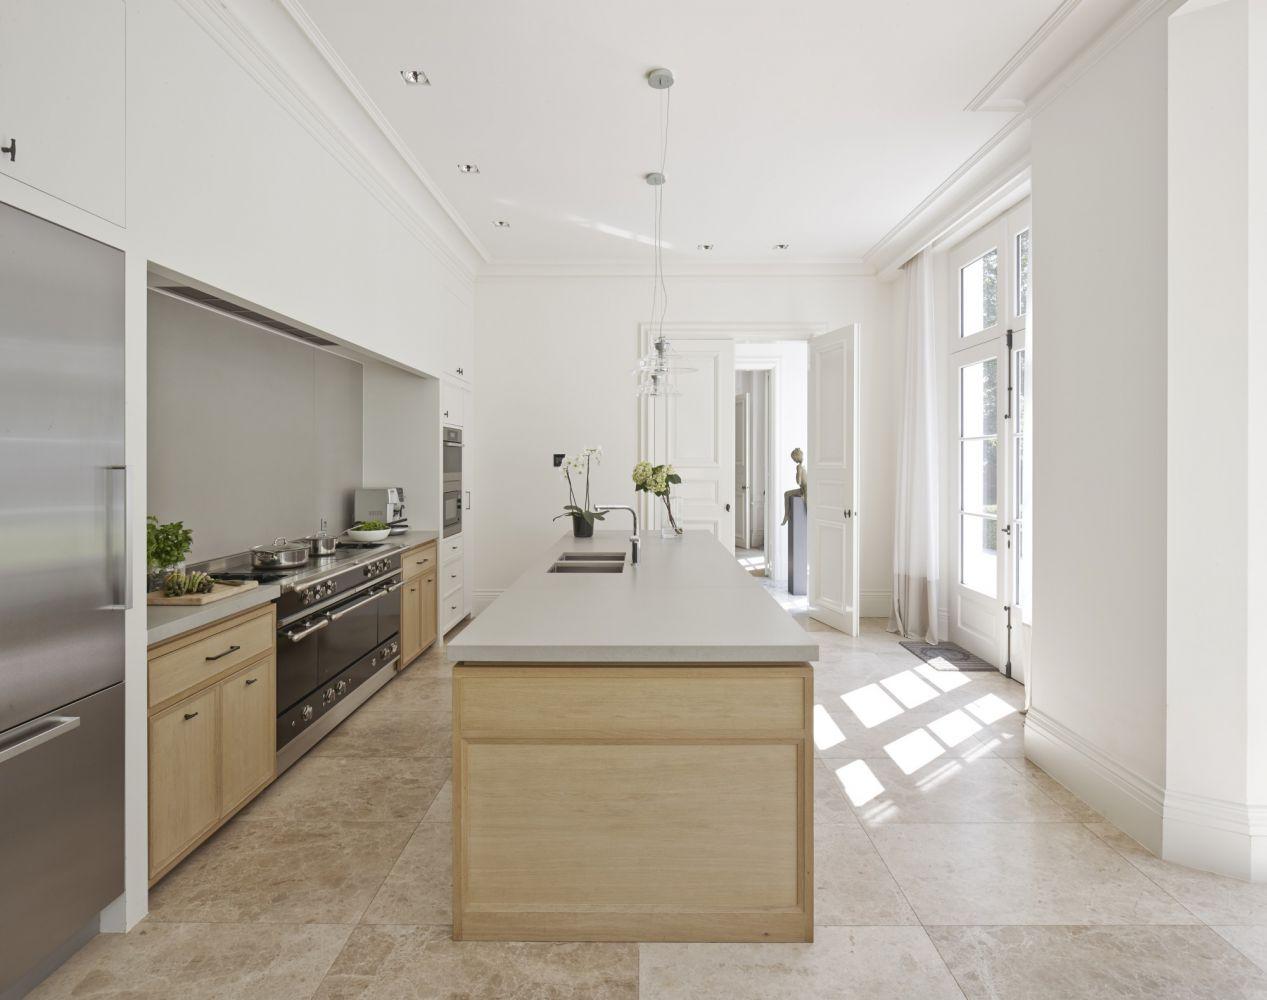 Interieur villabouw vlassak verhulst exclusieve villabouw - Moulure architectuur ...